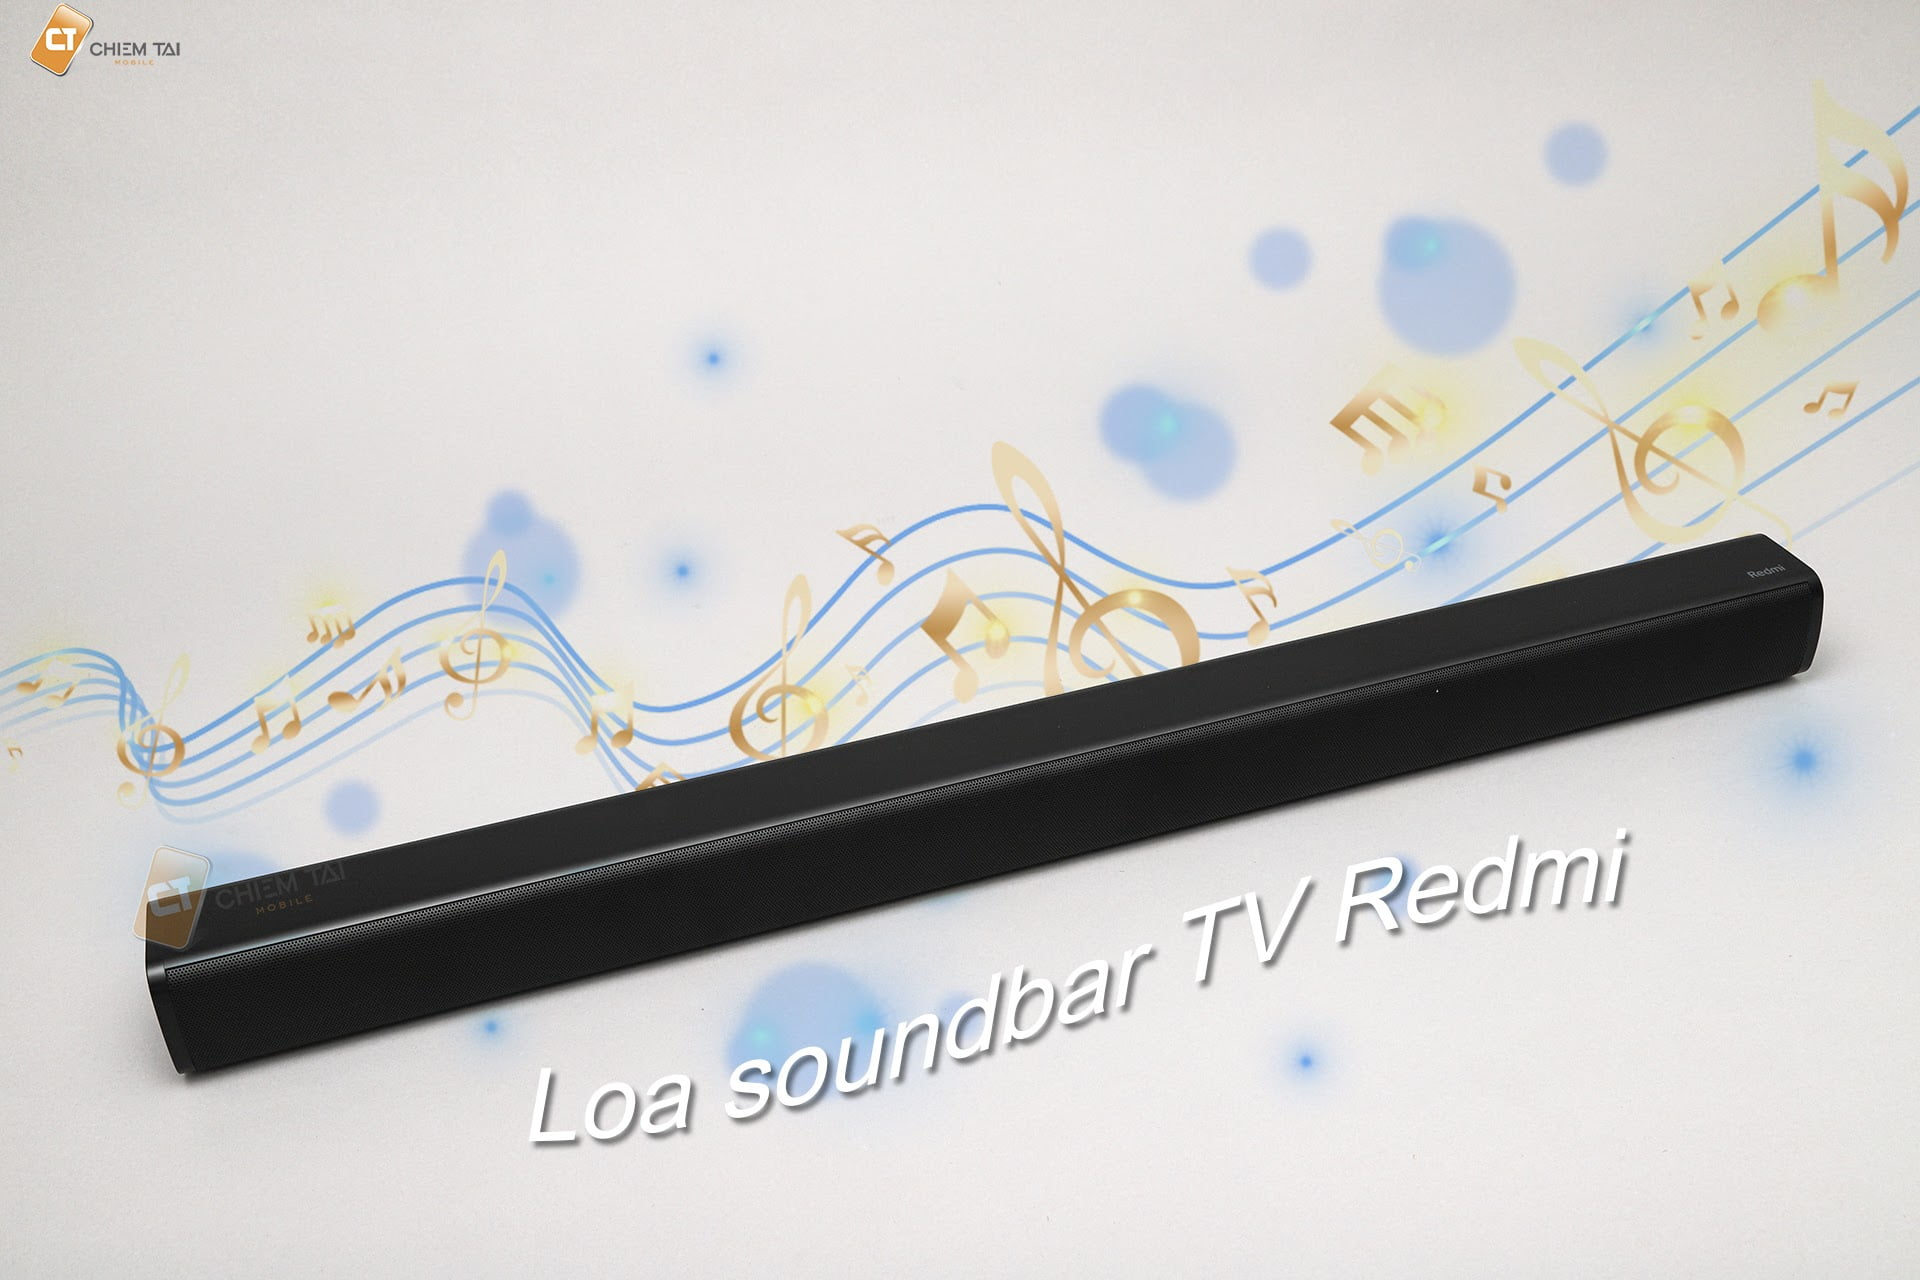 loa soundbar tv redmi 605da30ba67ee